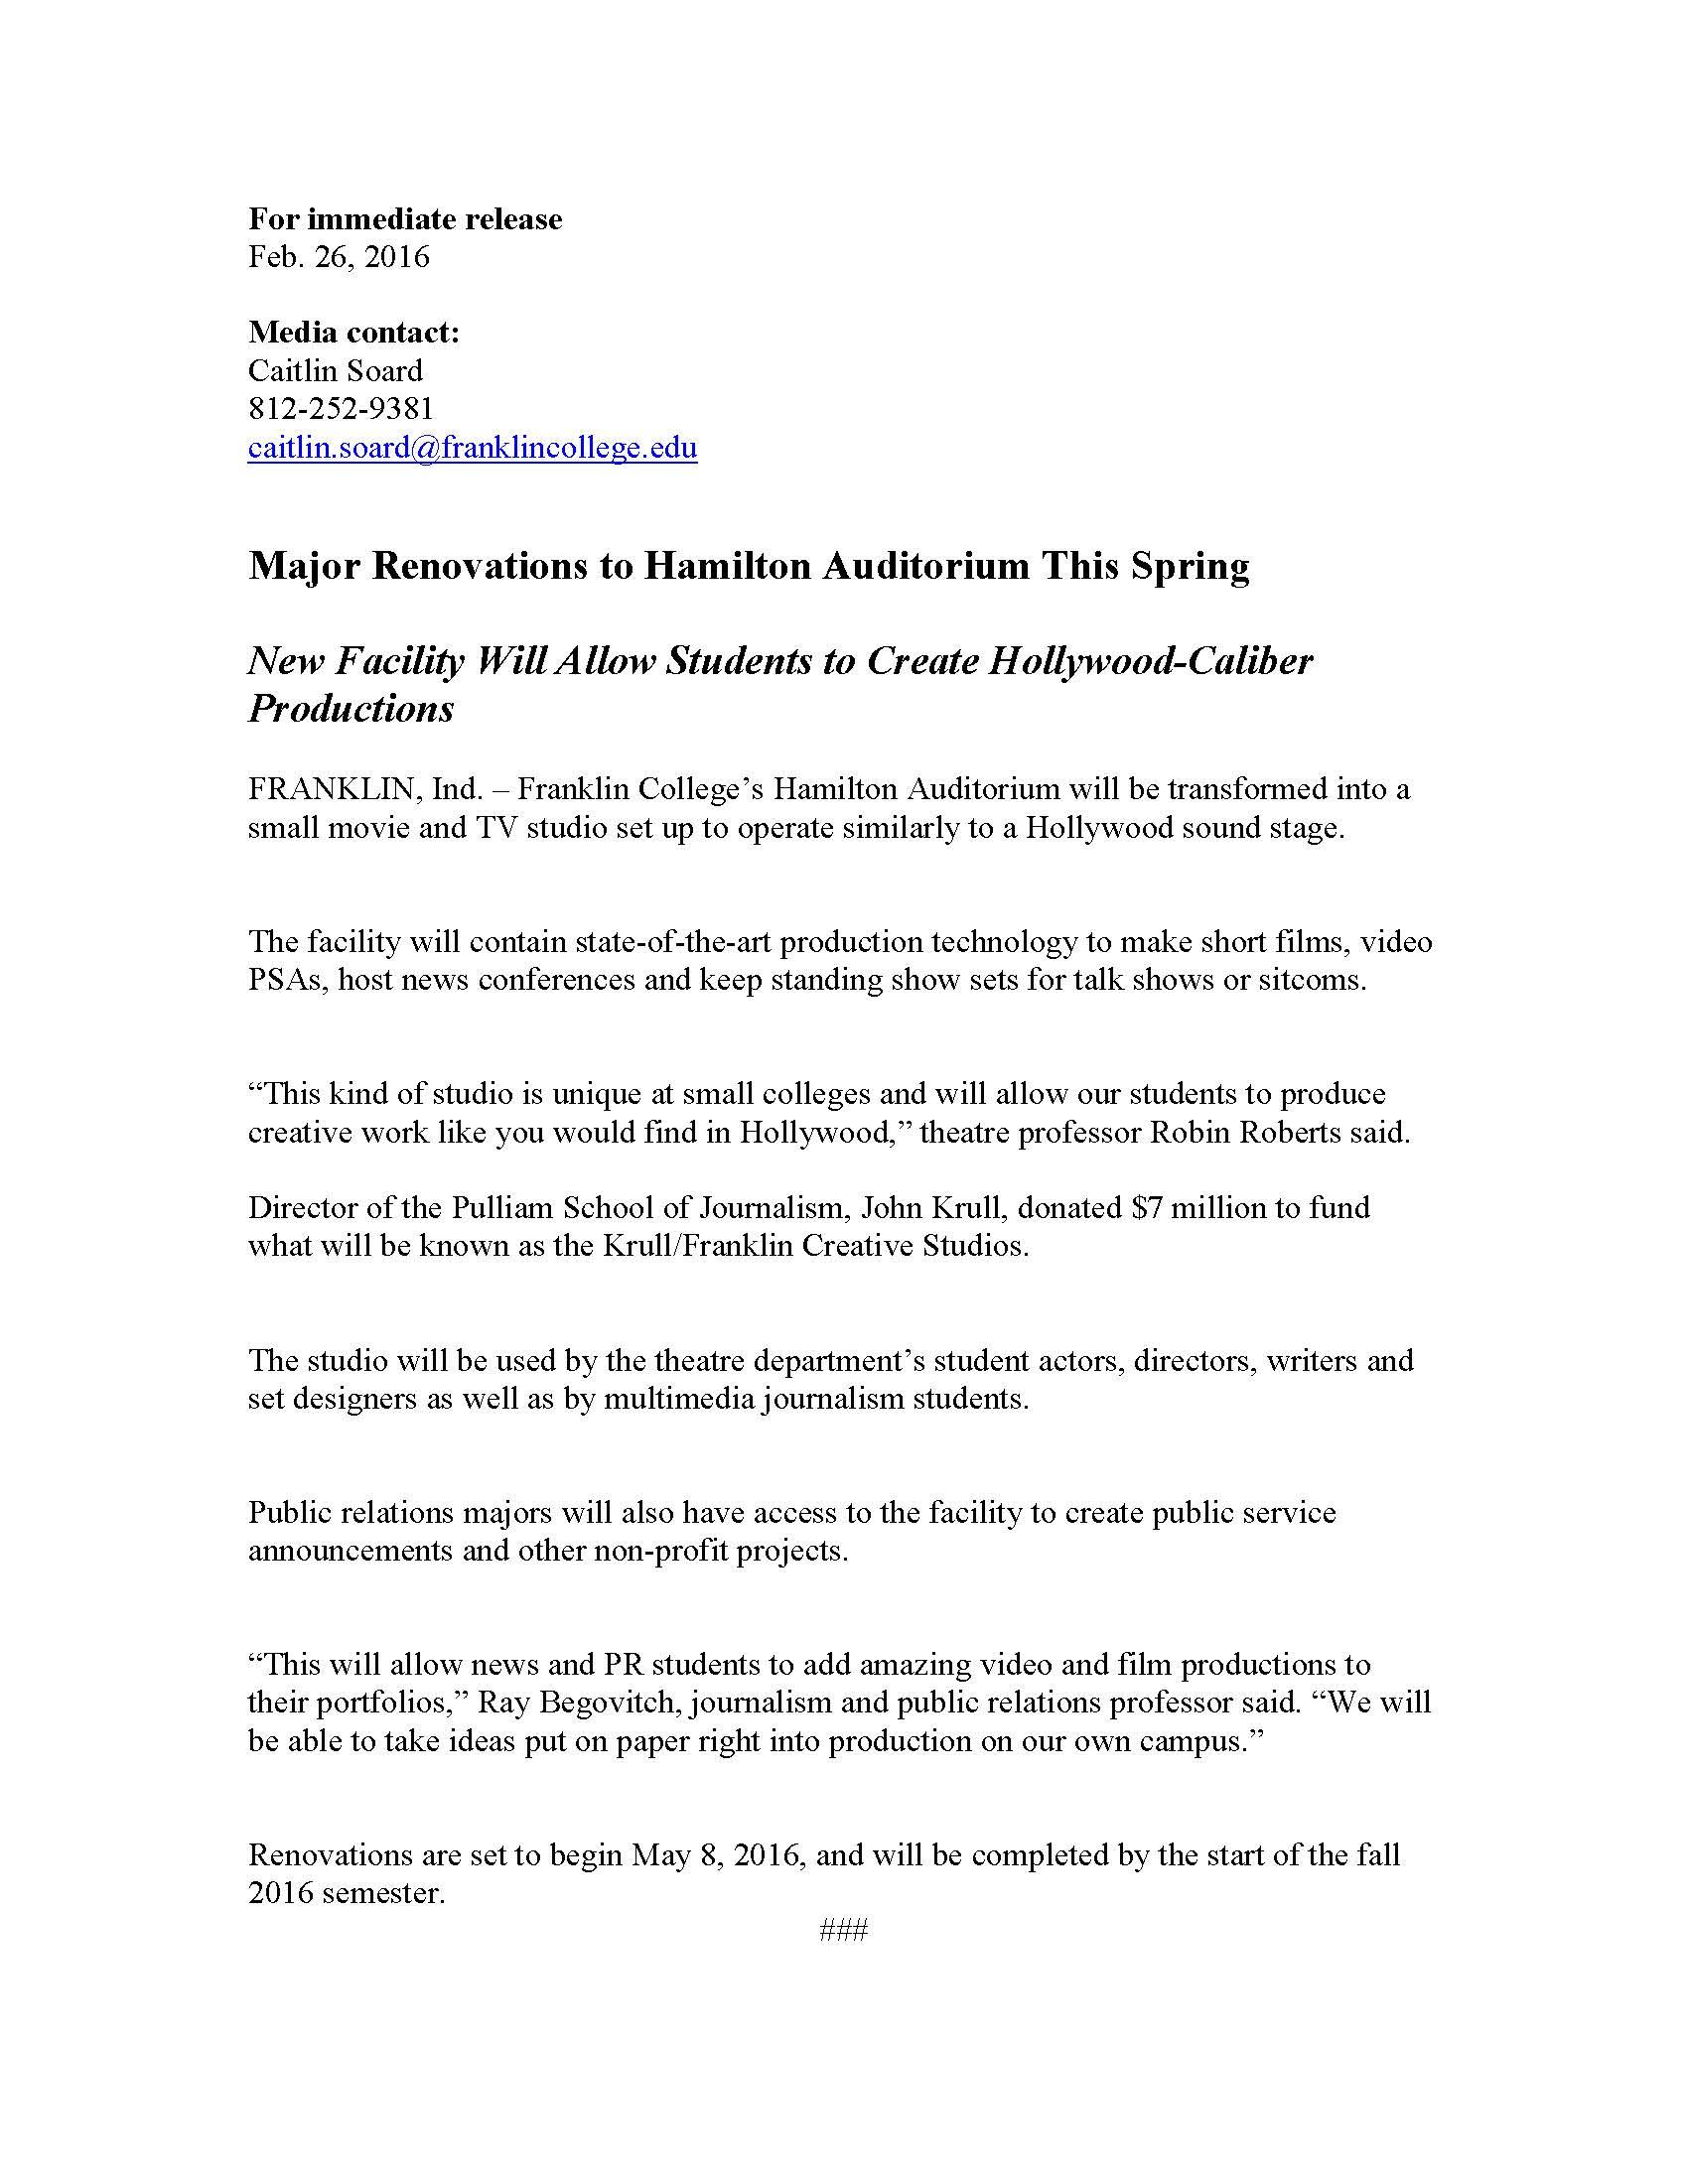 Hamilton Press release.jpg